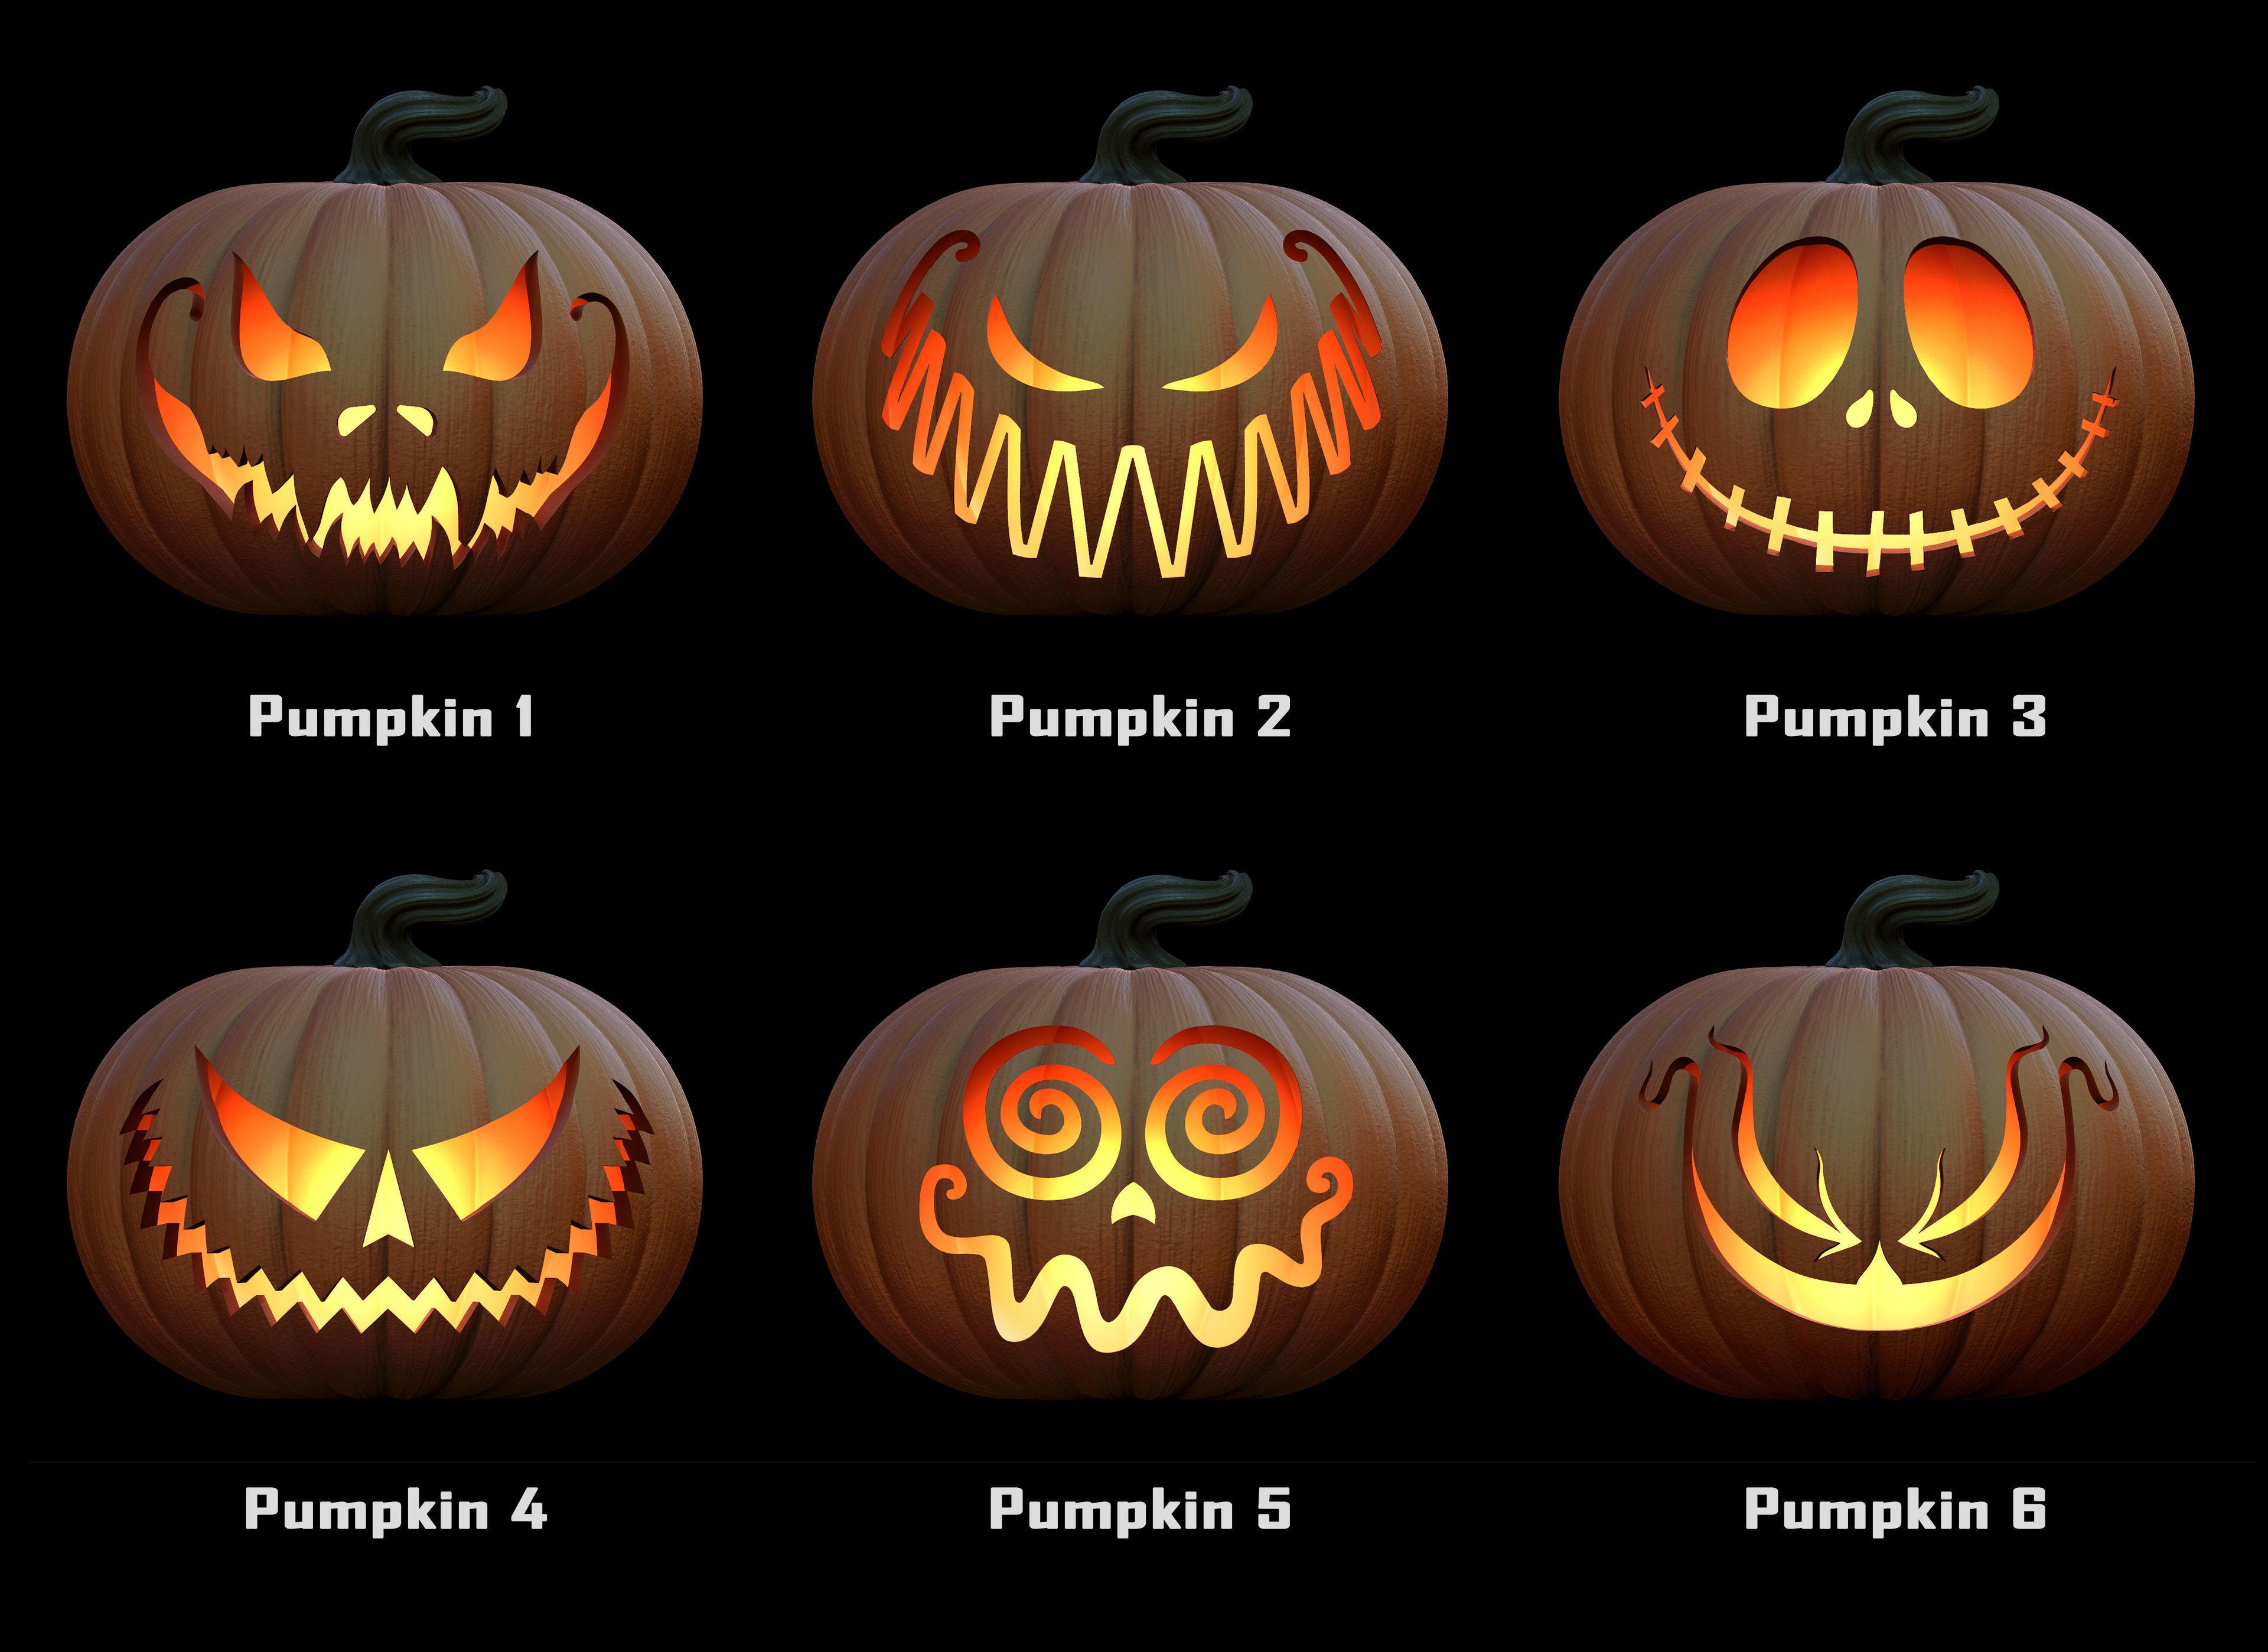 3d Printable Model Pumpkins For Halloween Cgtrader